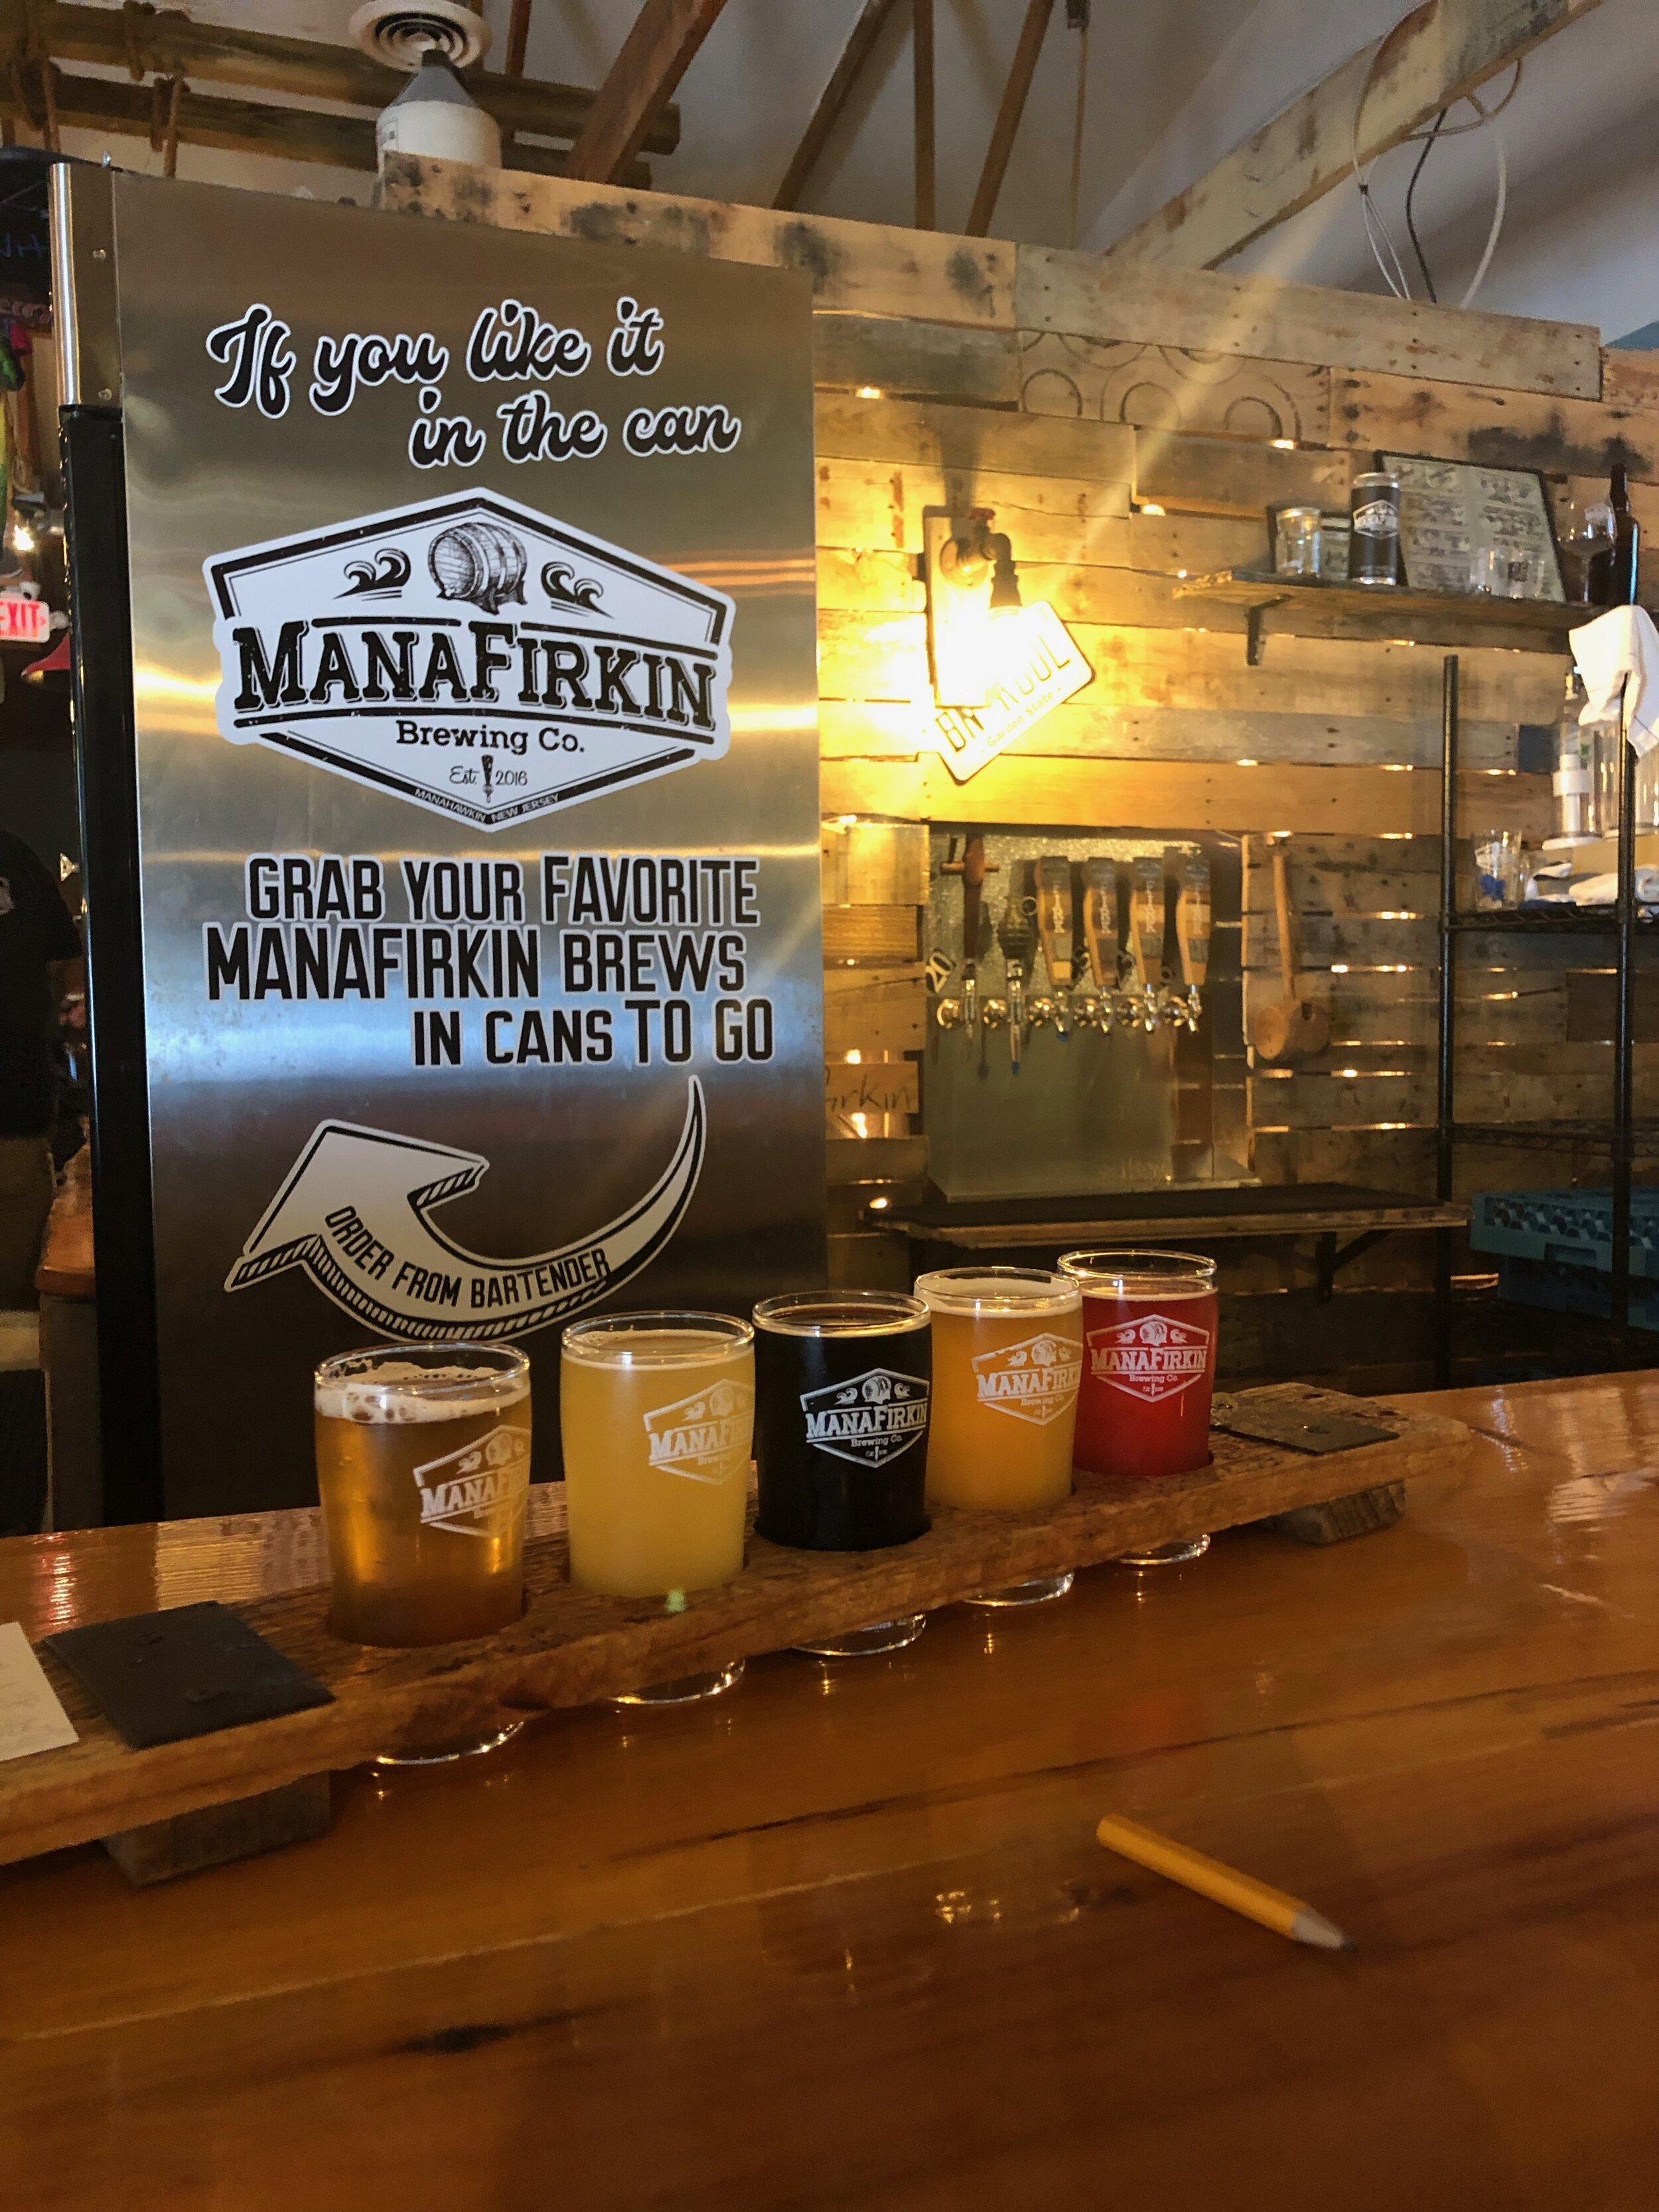 Manafirkin Brewing